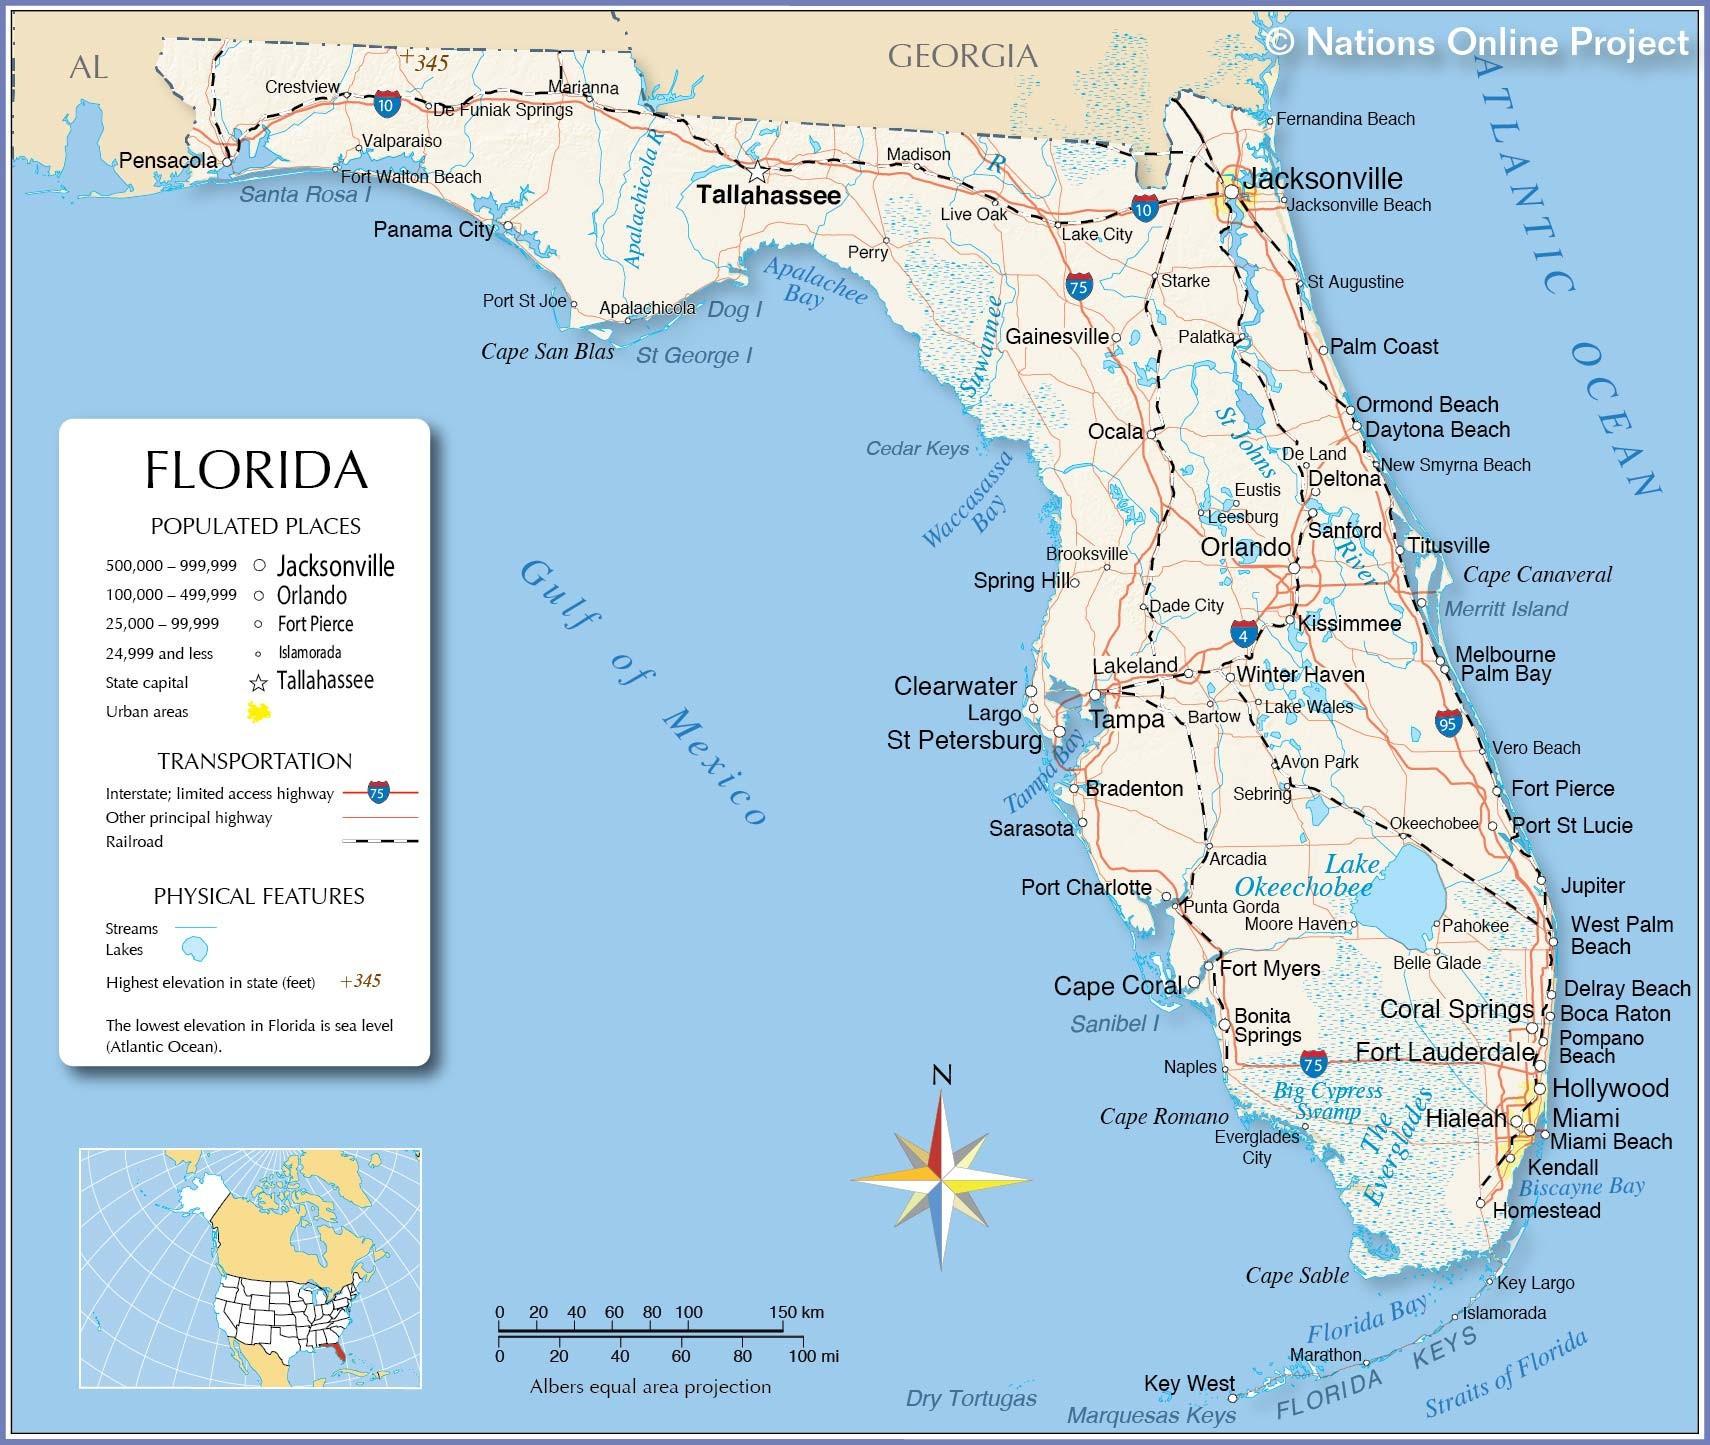 United States East Coast Map With Cities Inspirationa Florida - Florida Atlantic Coast Map